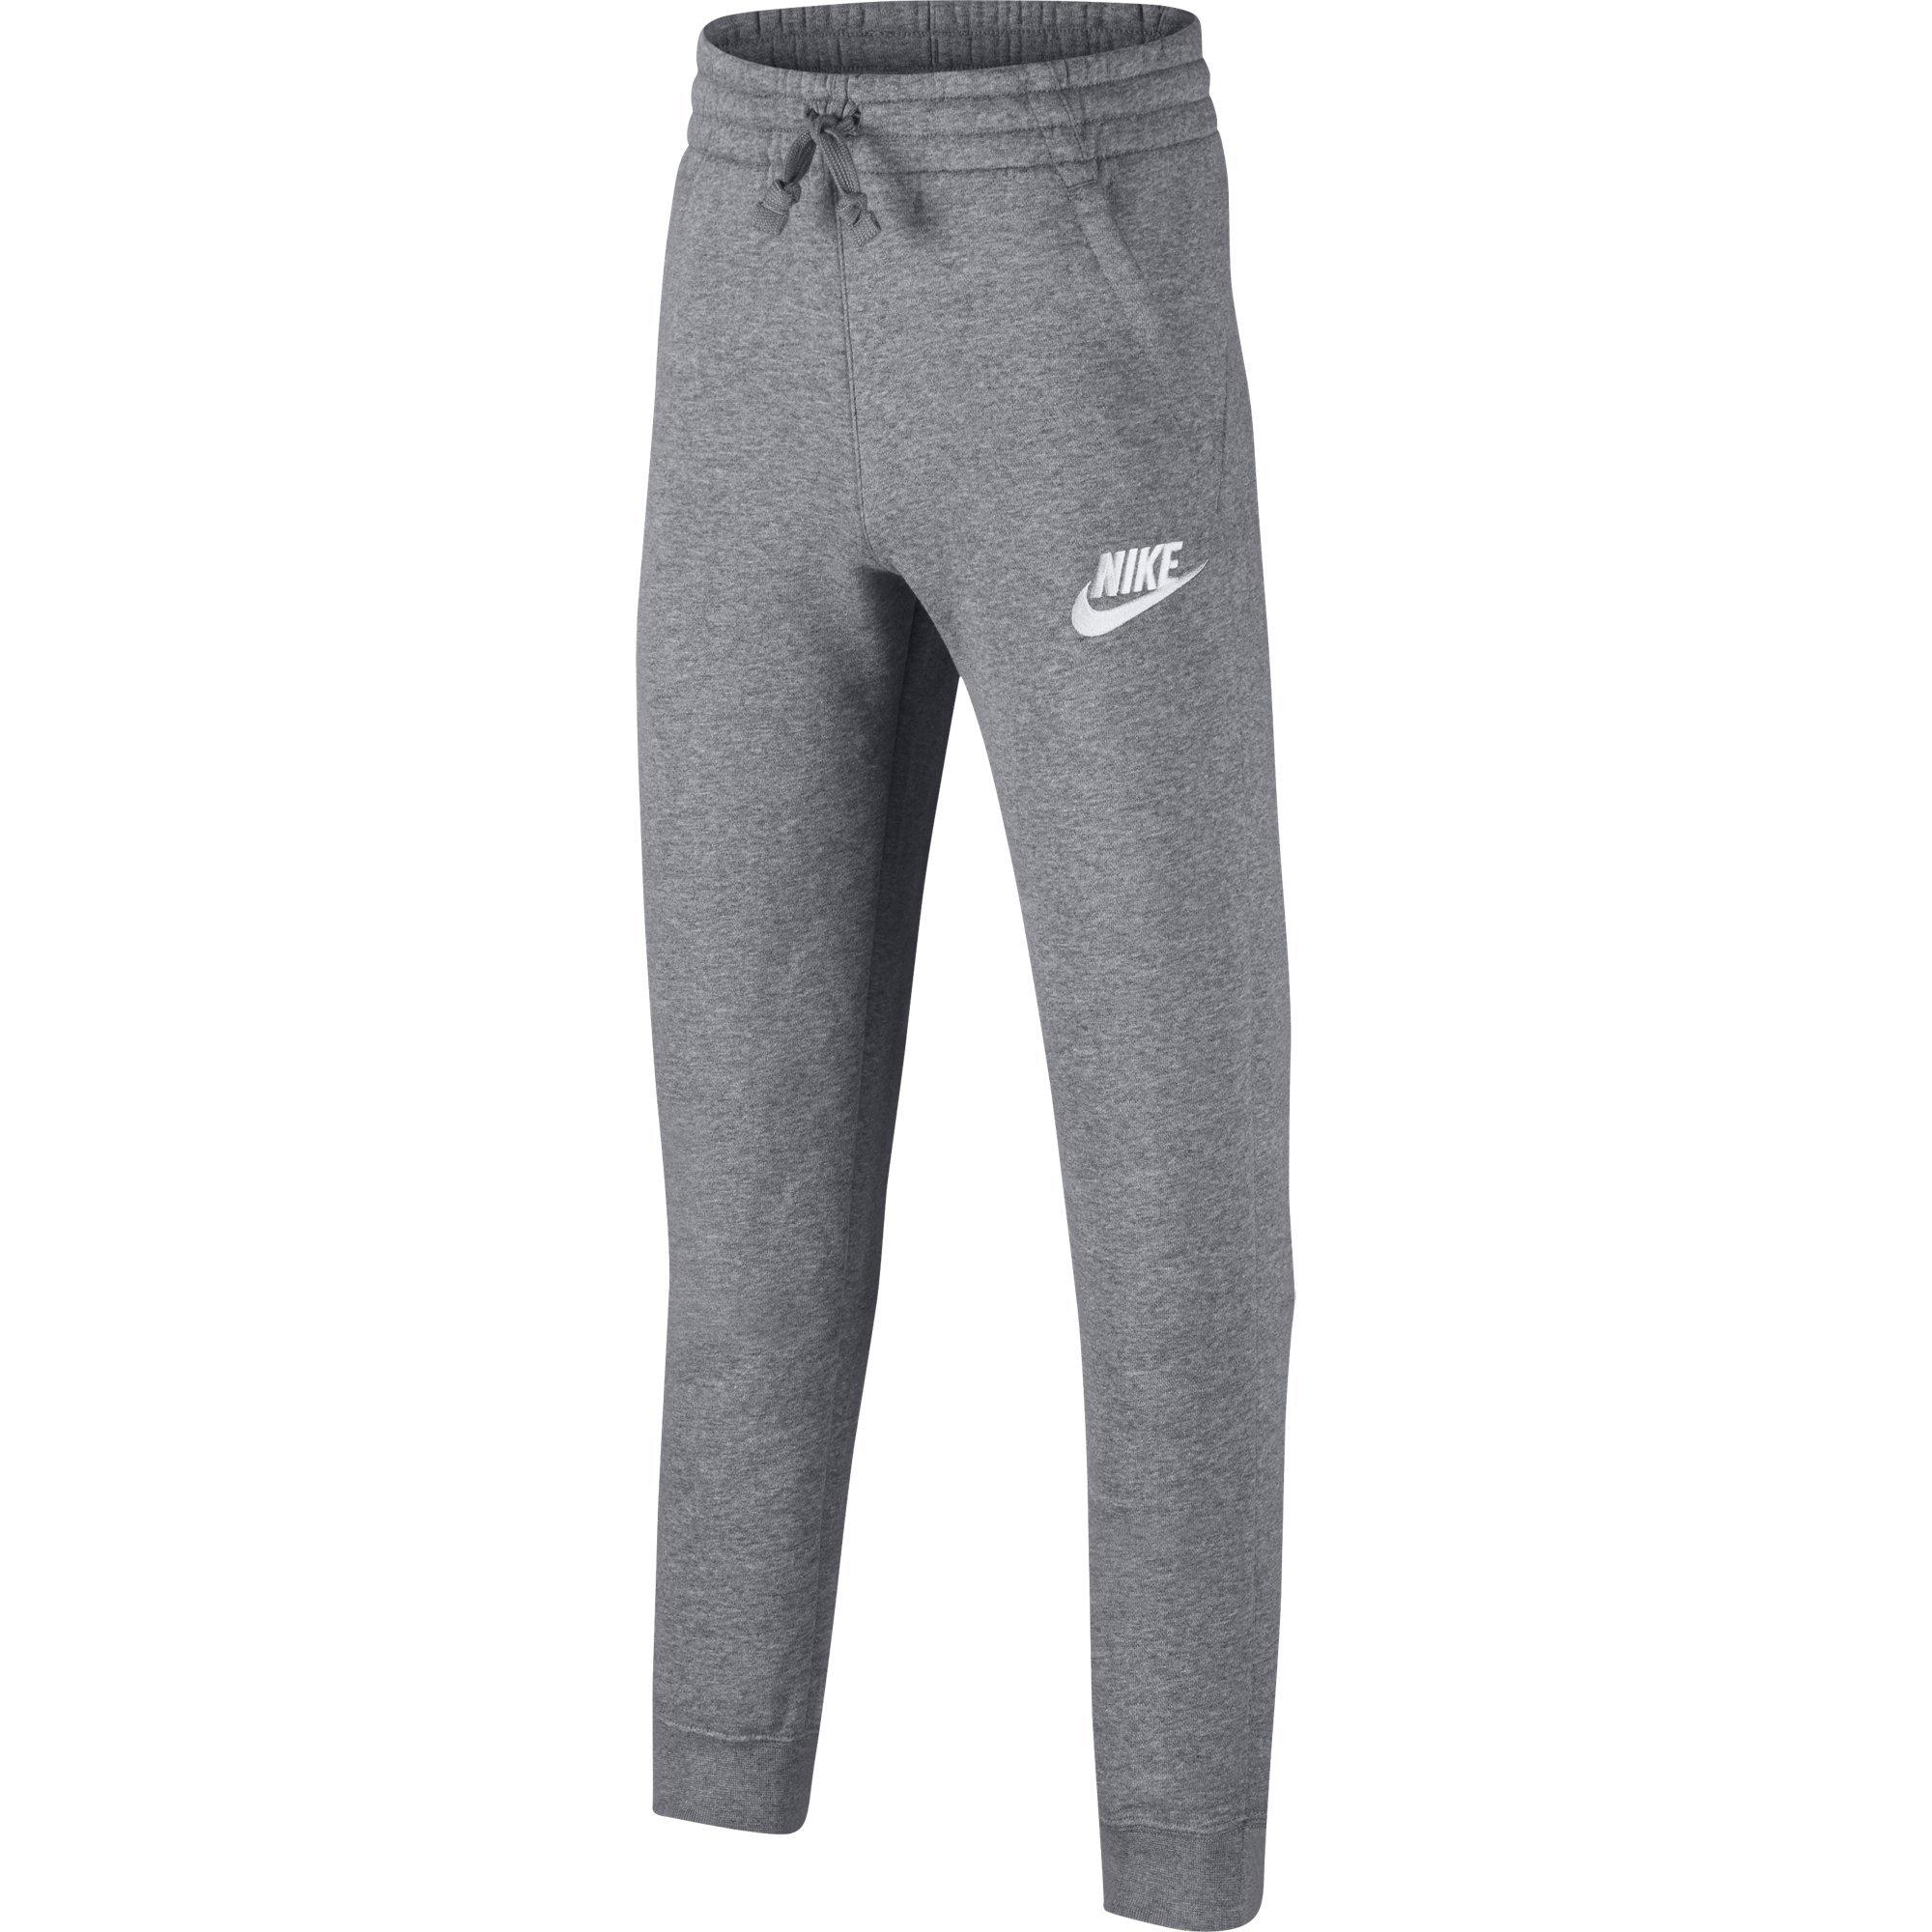 NIKE Sportswear Boys' Club Fleece Joggers, Carbon Heather/Cool Grey/White, X-Small